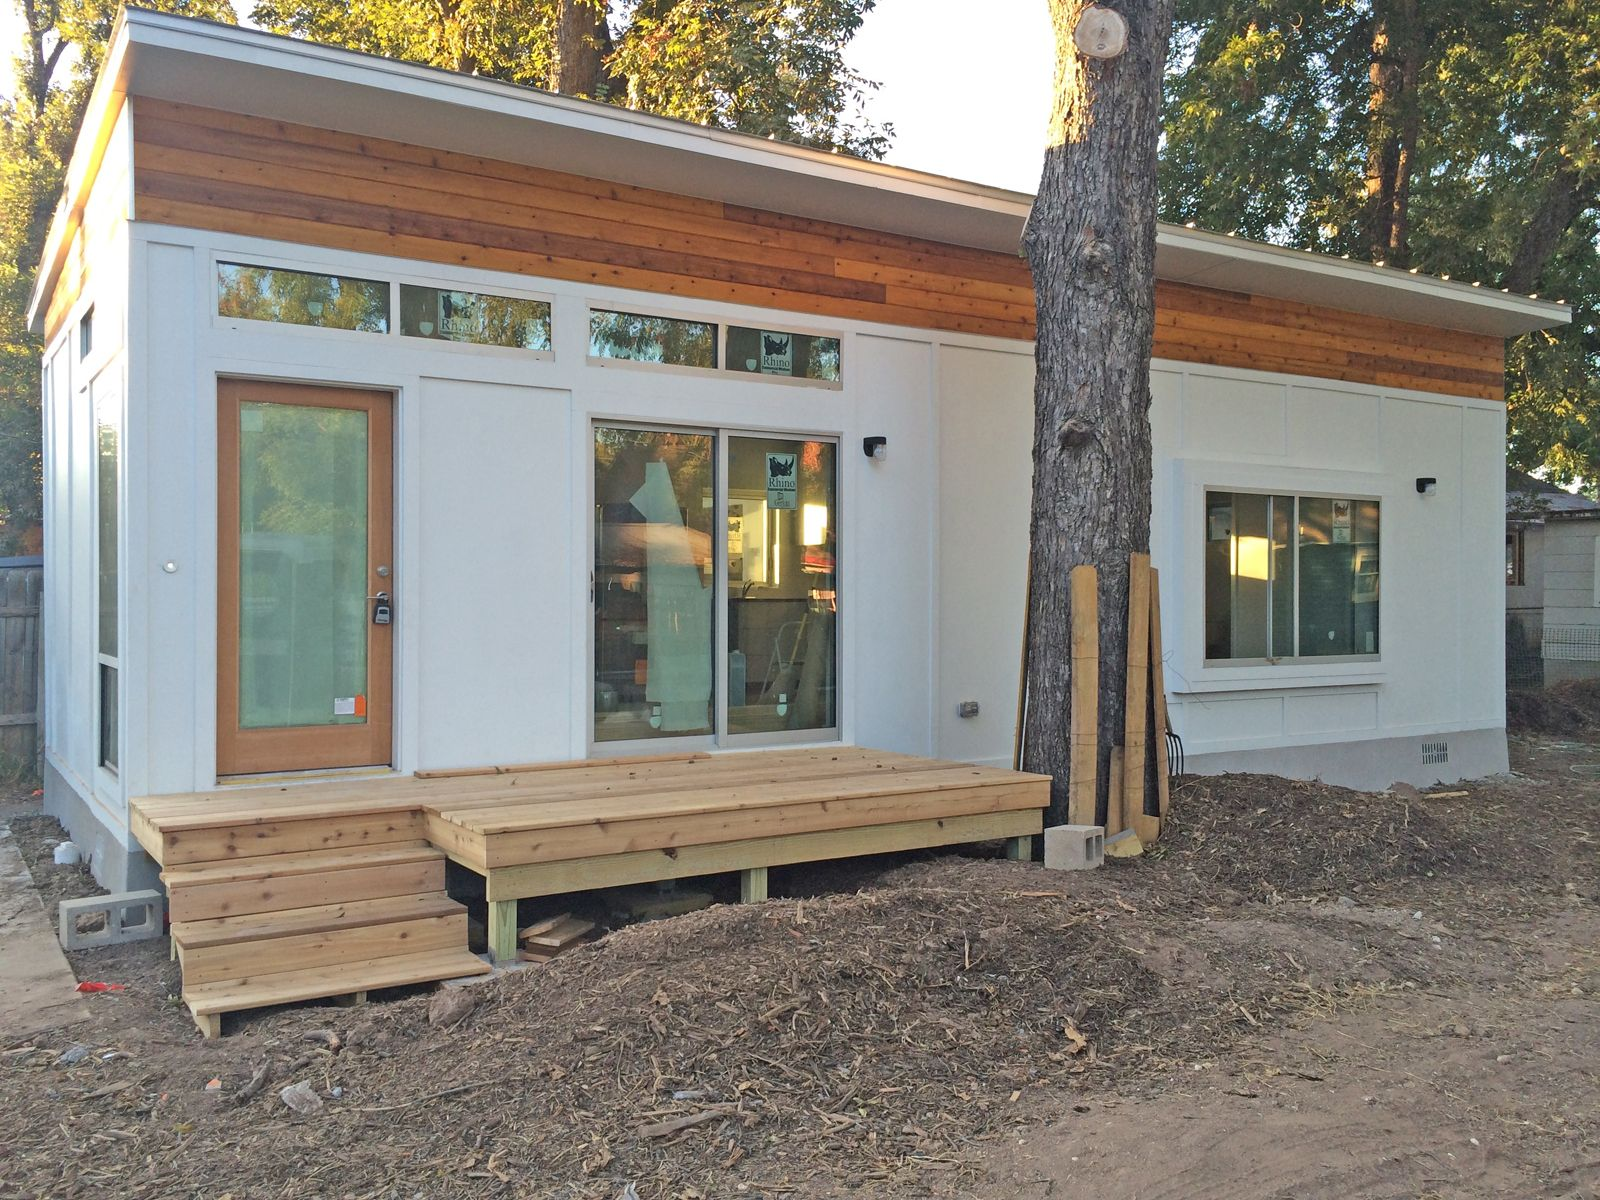 550 Sq Ft 1 Bed 1 Bath Modern Modular Homes Small Modular Homes Prefab Homes